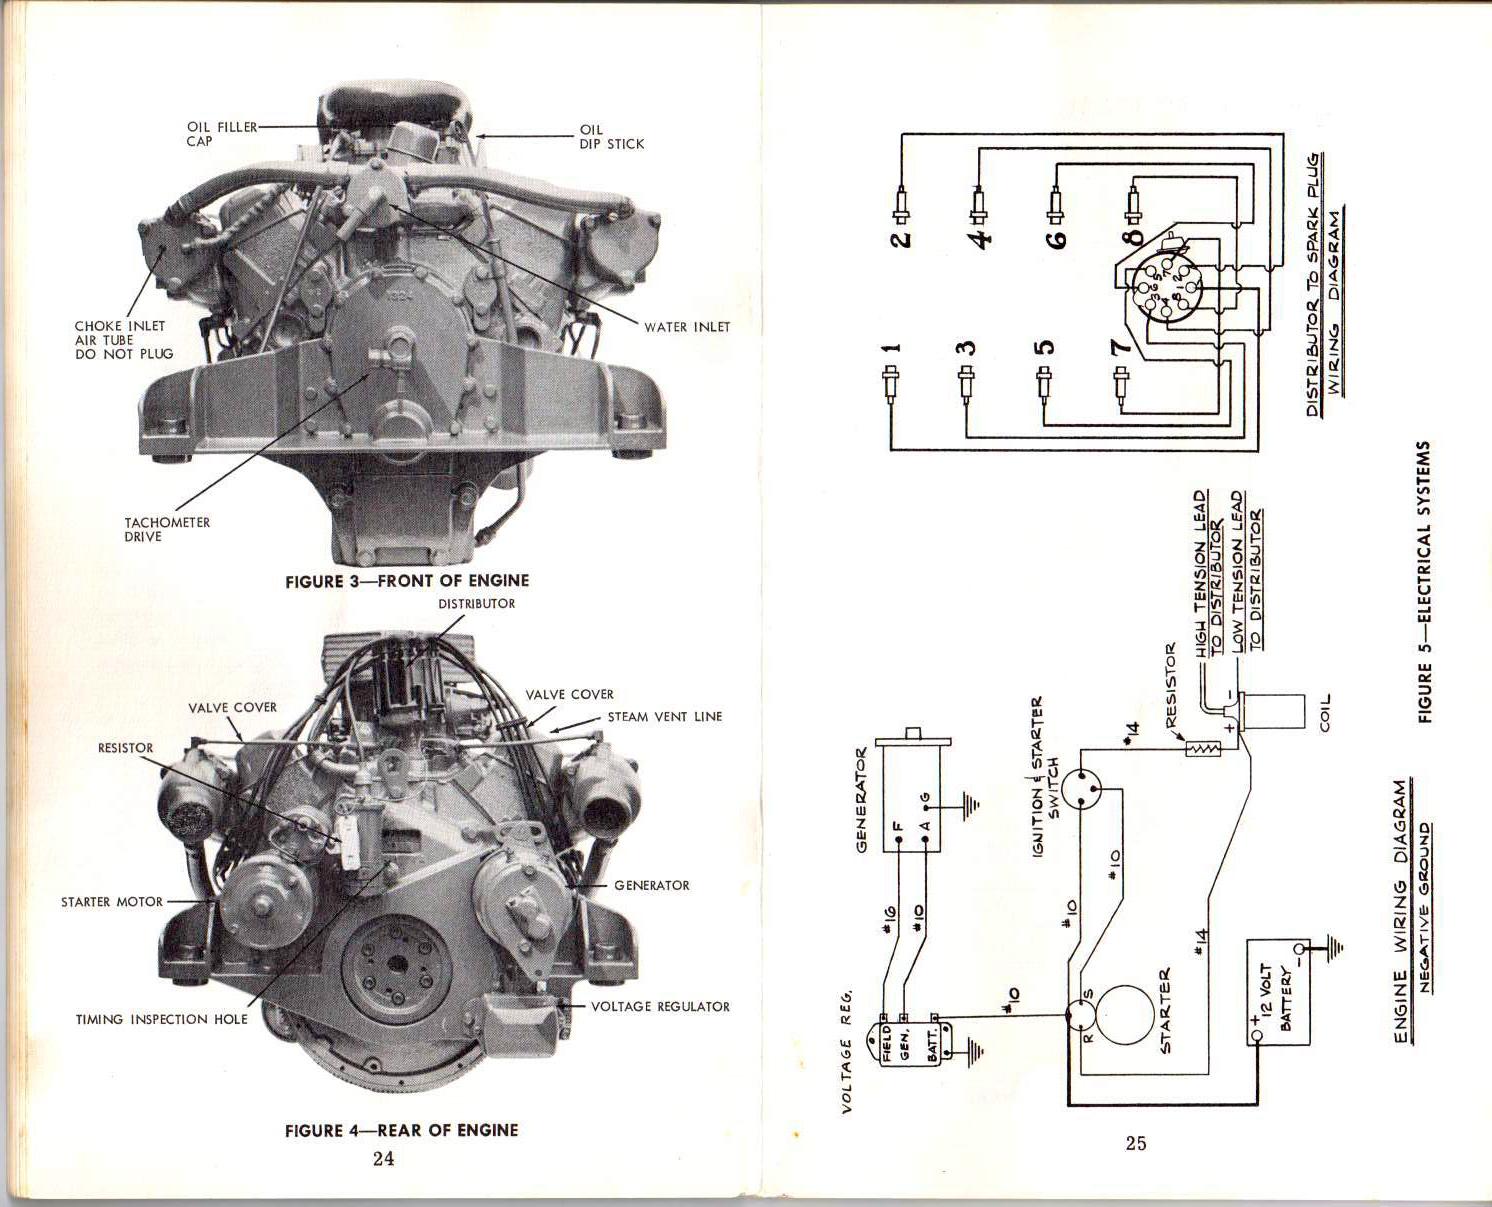 F1 Engine Swap